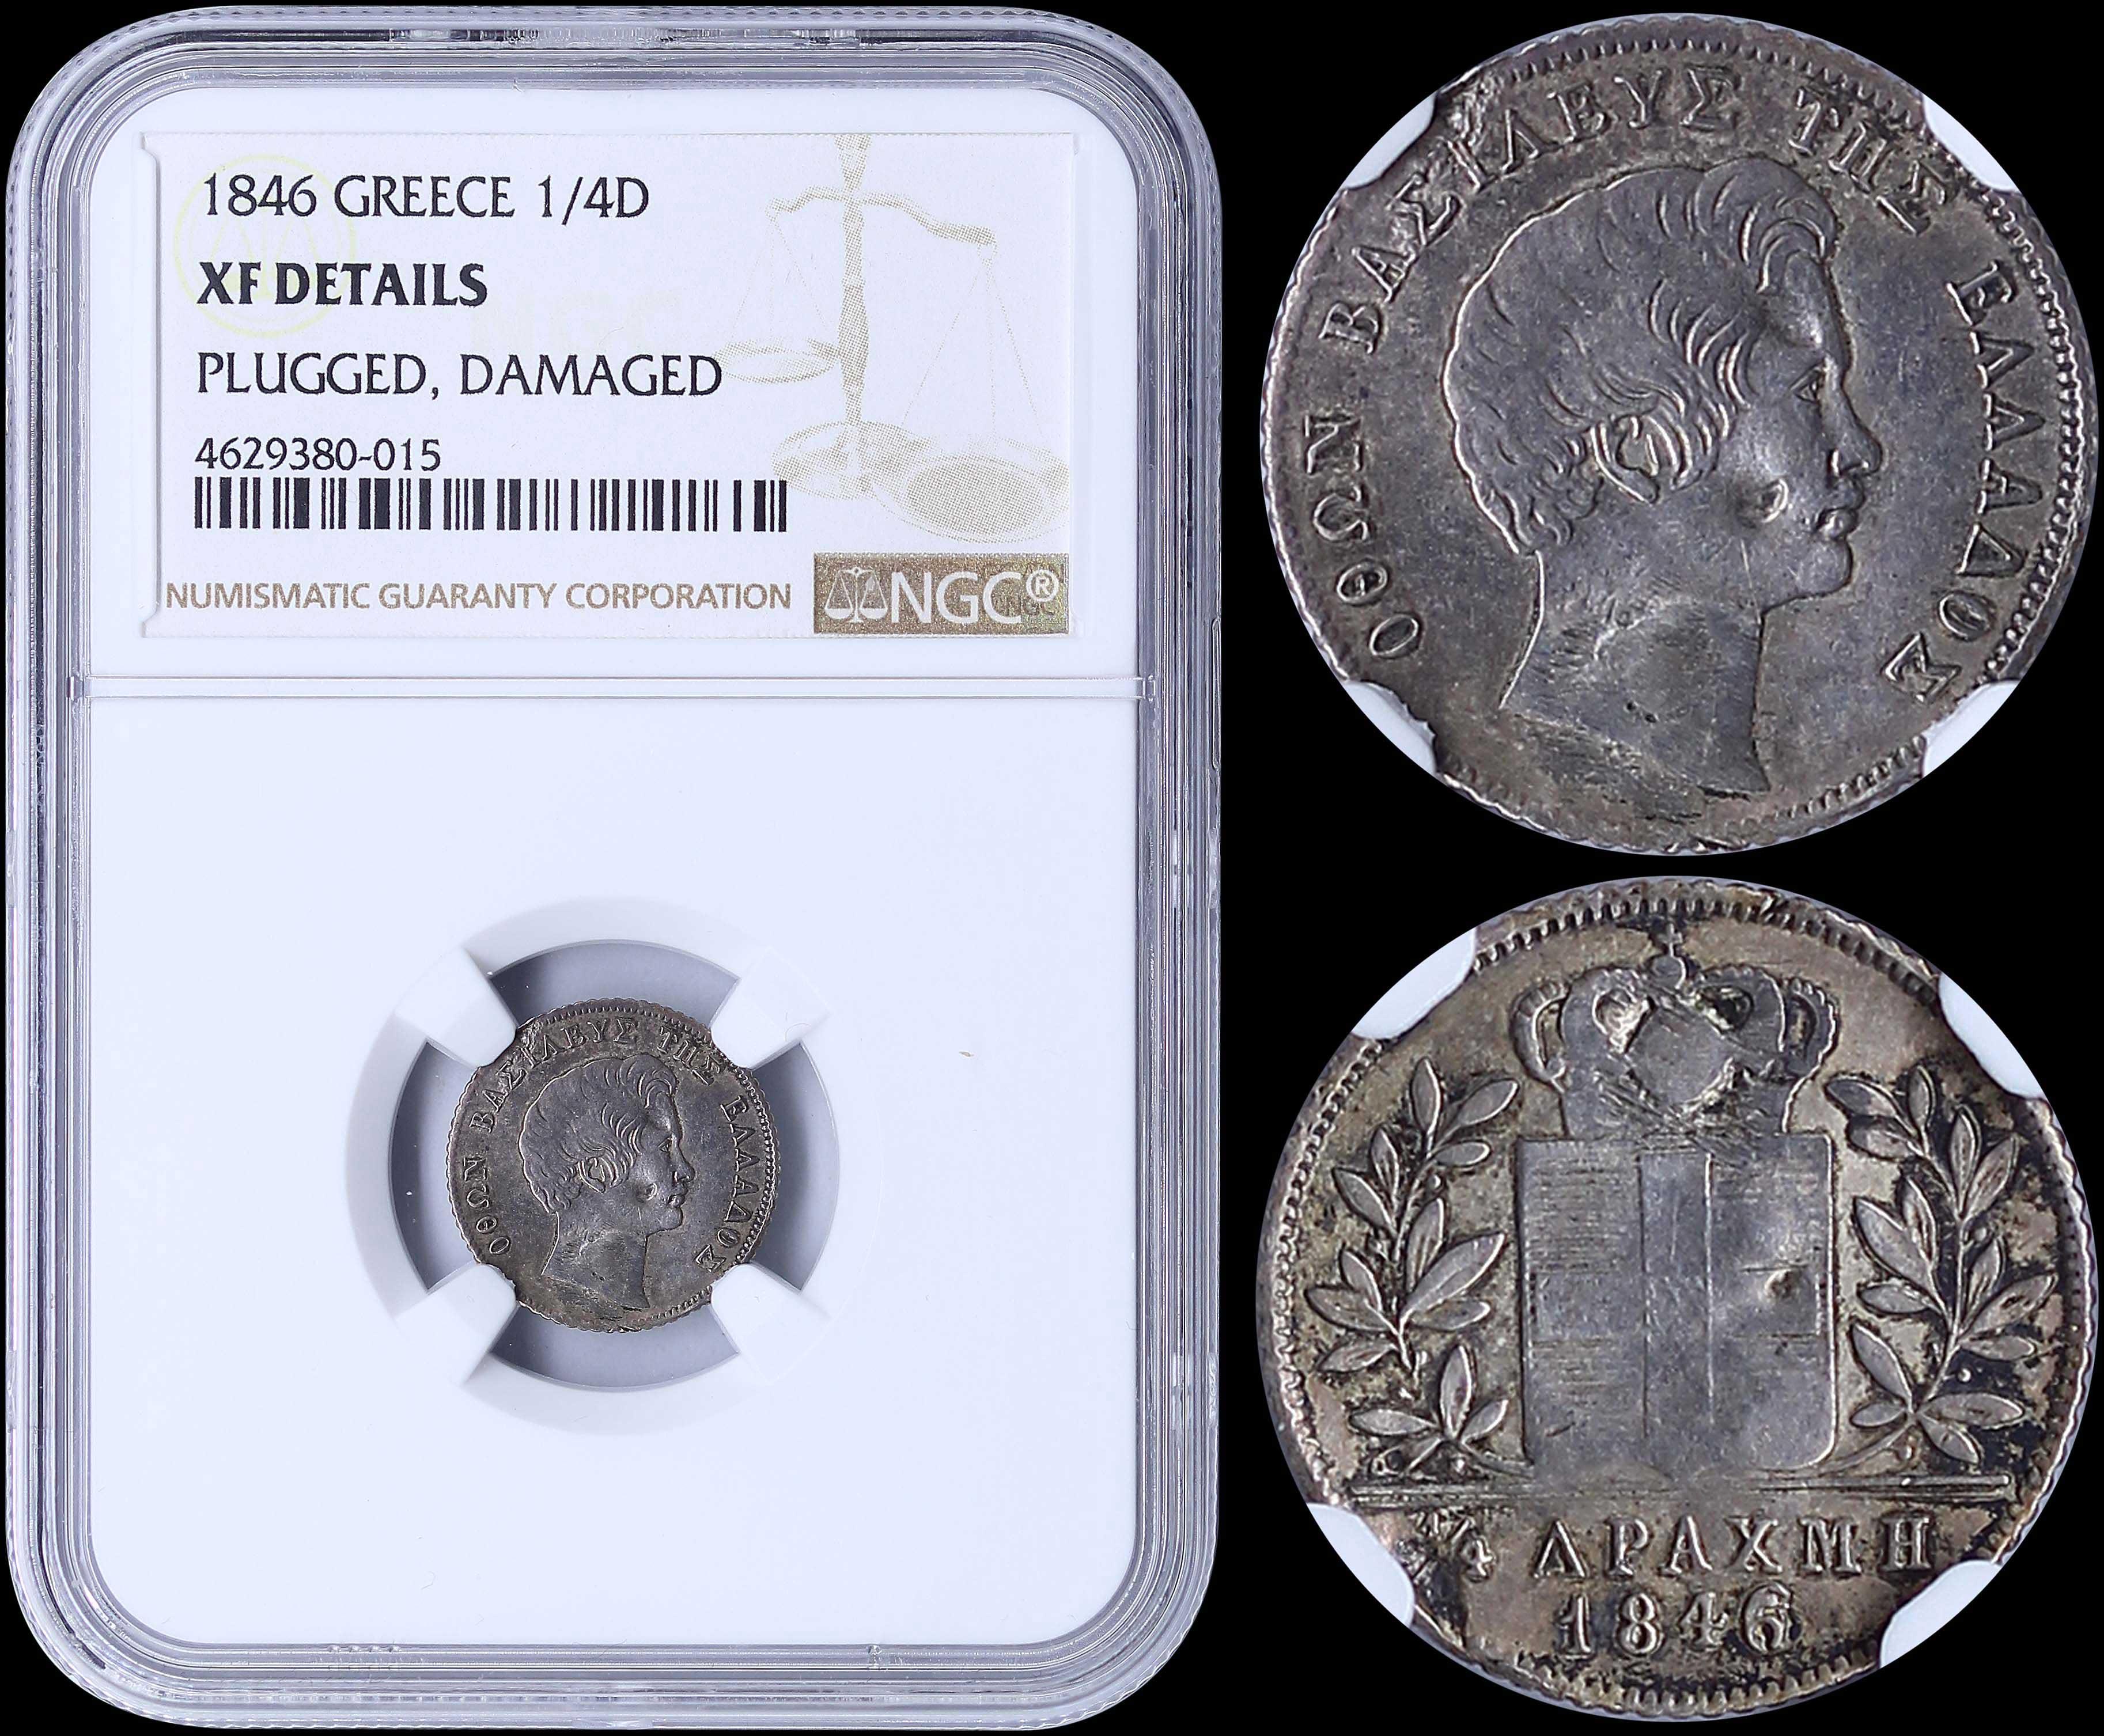 Lot 8104 - -  COINS & TOKENS king otto -  A. Karamitsos Public & Live Bid Auction 644 Coins, Medals & Banknotes